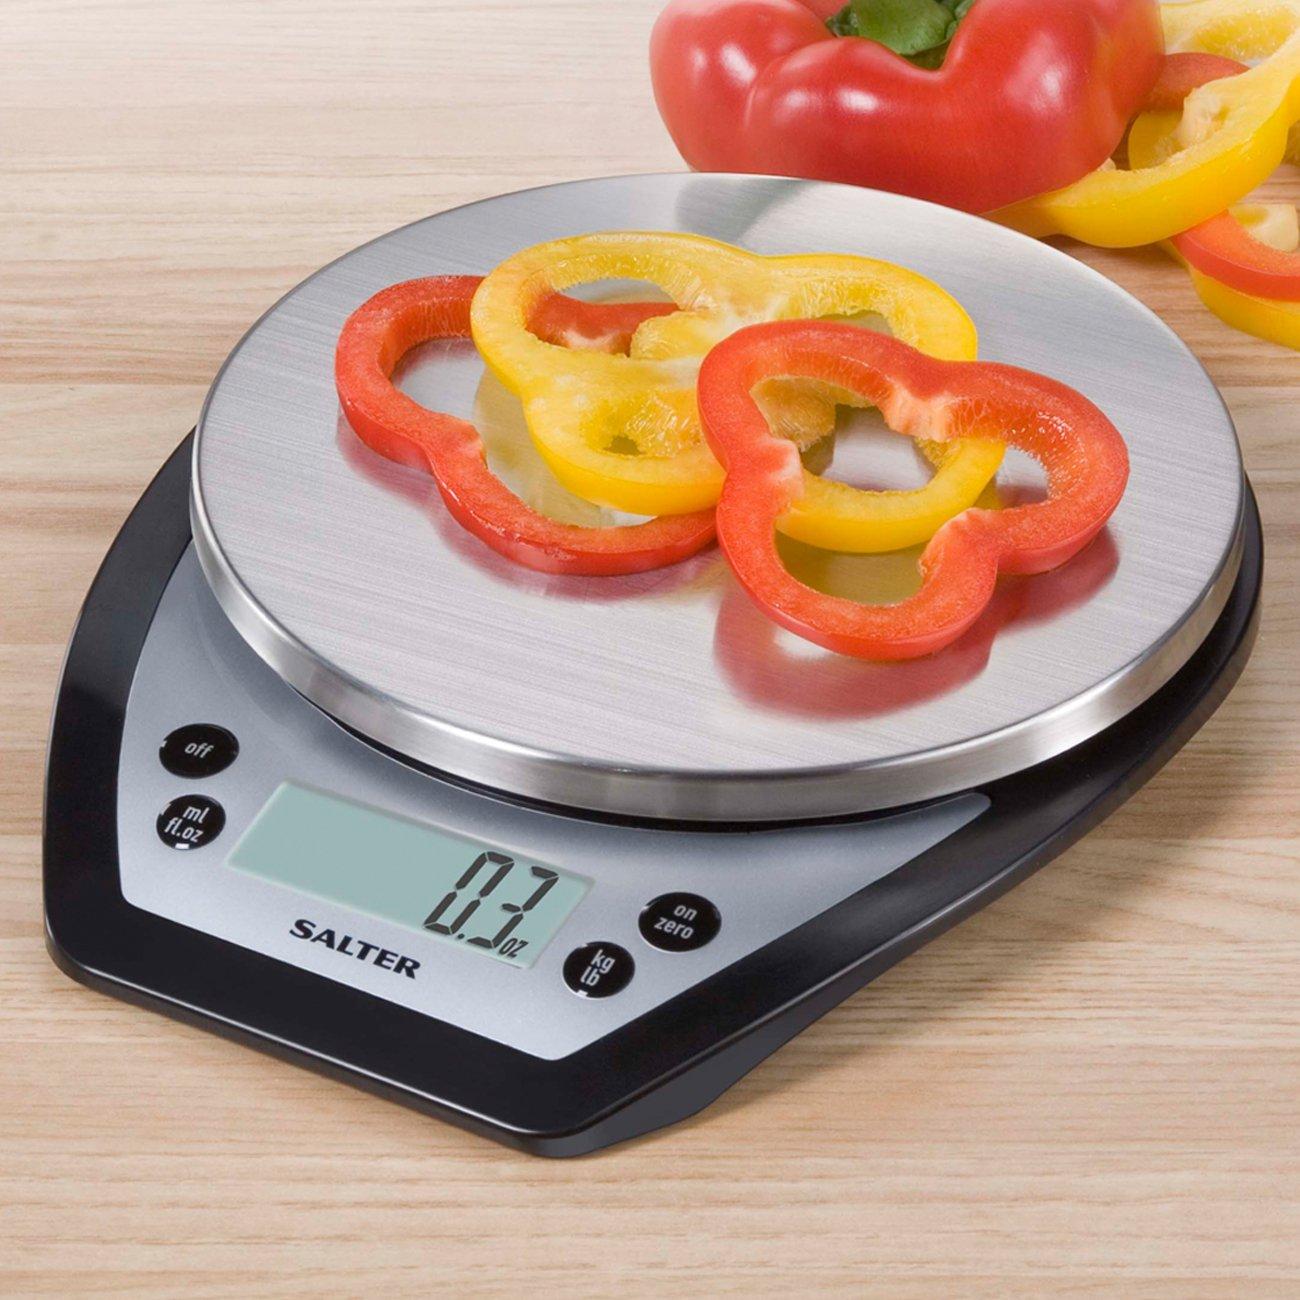 Salter 1020BKSS Aquatronic Digital Kitchen Scale 1020BKSS